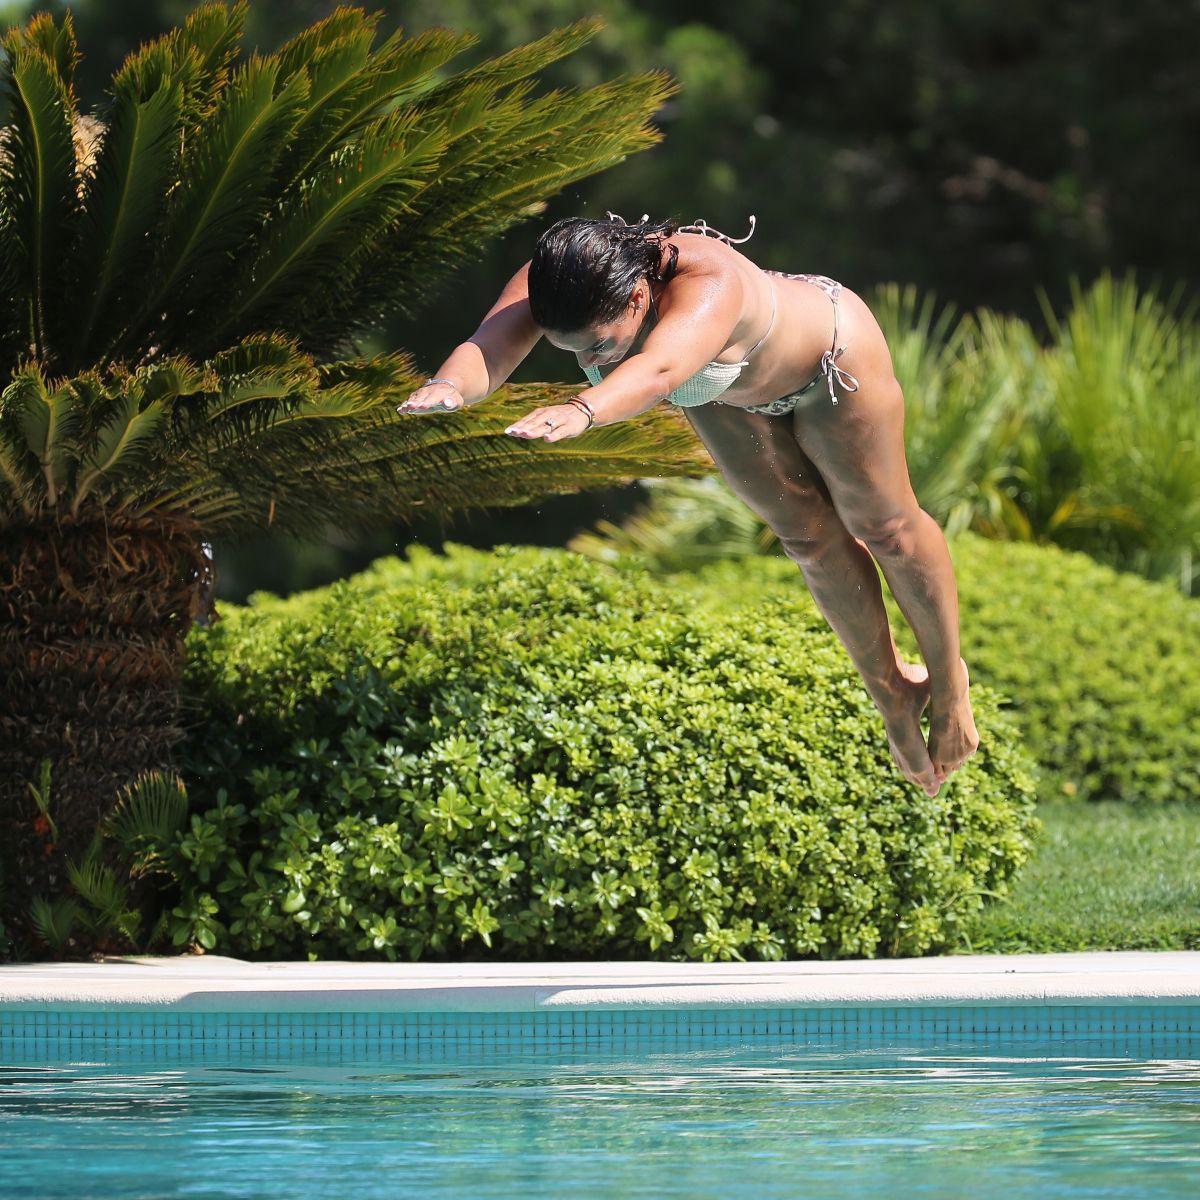 Rebekah Vardy in Bikini at a Pool in Portugal